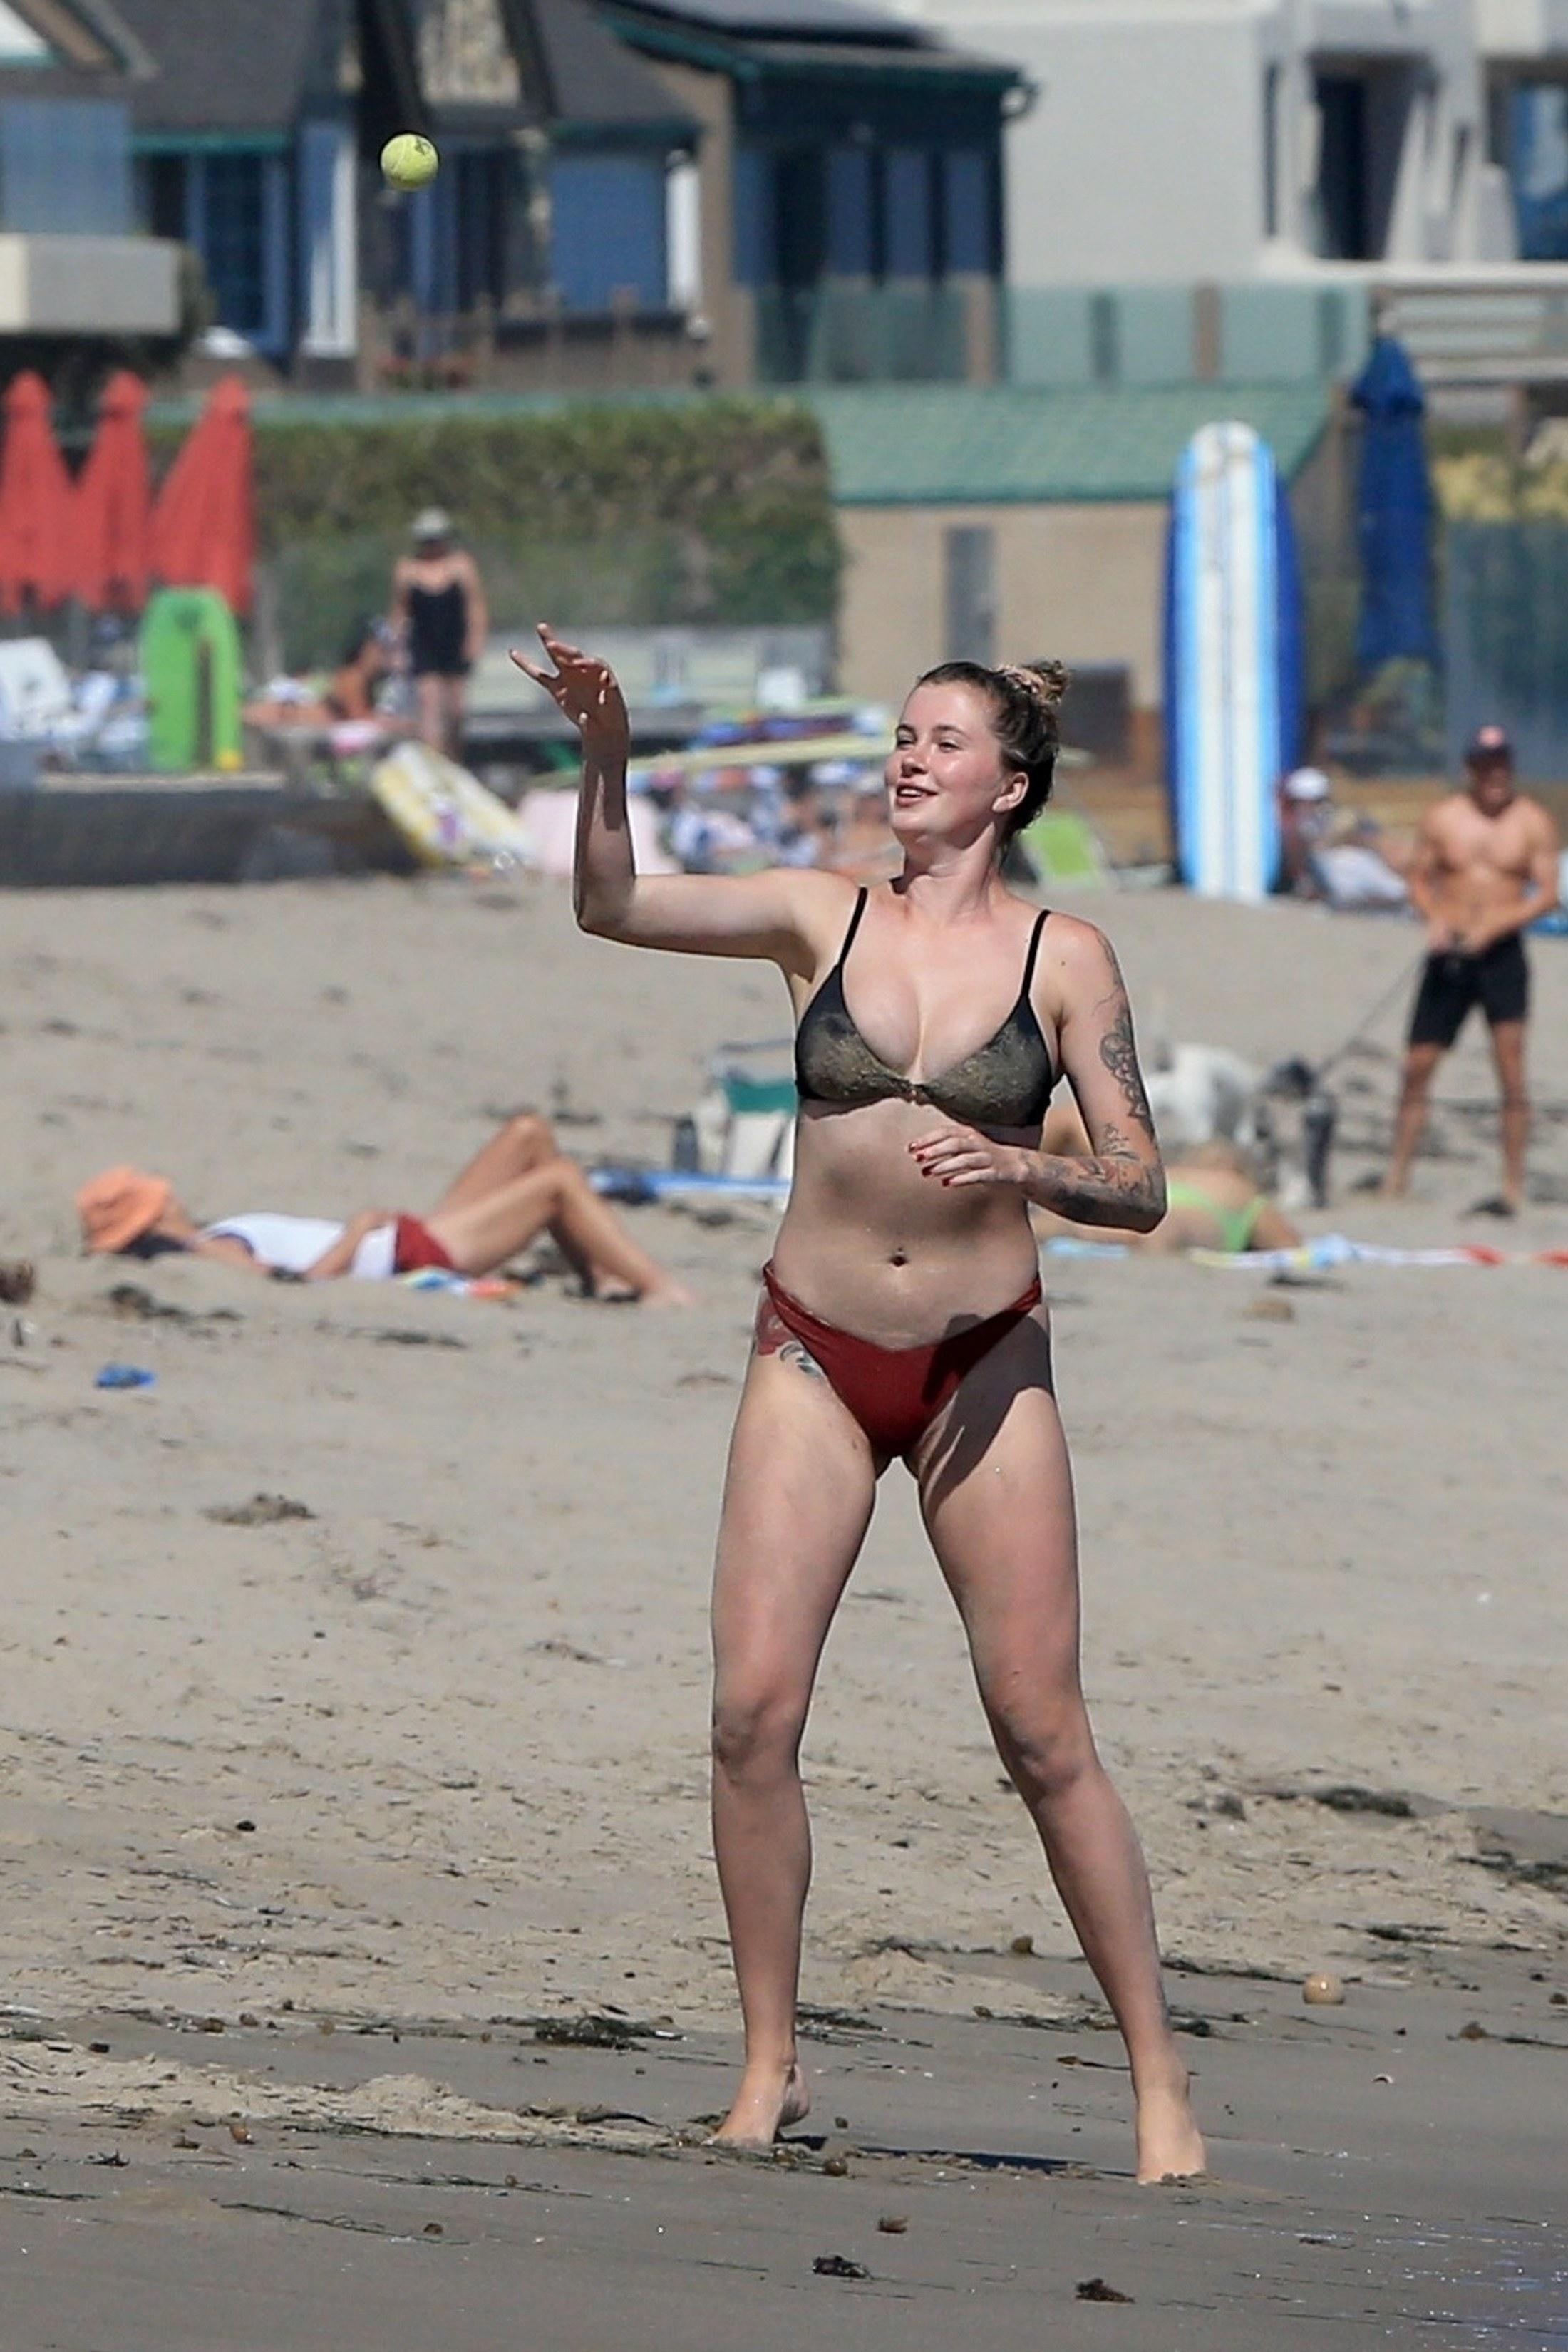 Ireland Baldwin playing volleyball on the beach